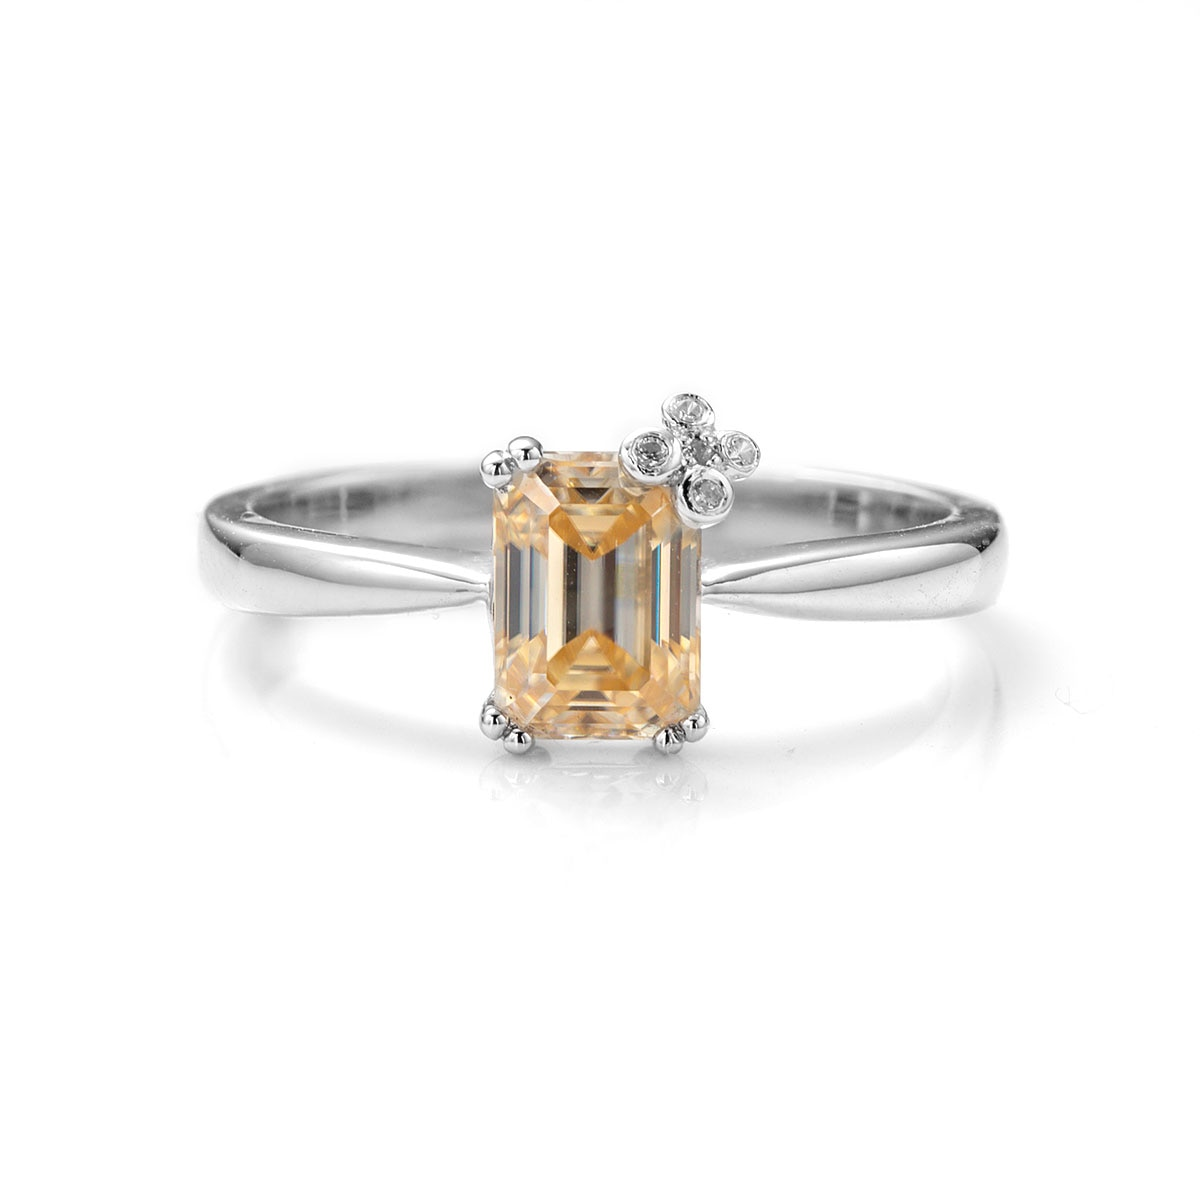 BOEYCJR 925 الفضة 1ct 5*7 مللي متر الزمرد قص الشمبانيا مويسانيتي VVS1 المشاركة خاتم الماس الزفاف للنساء